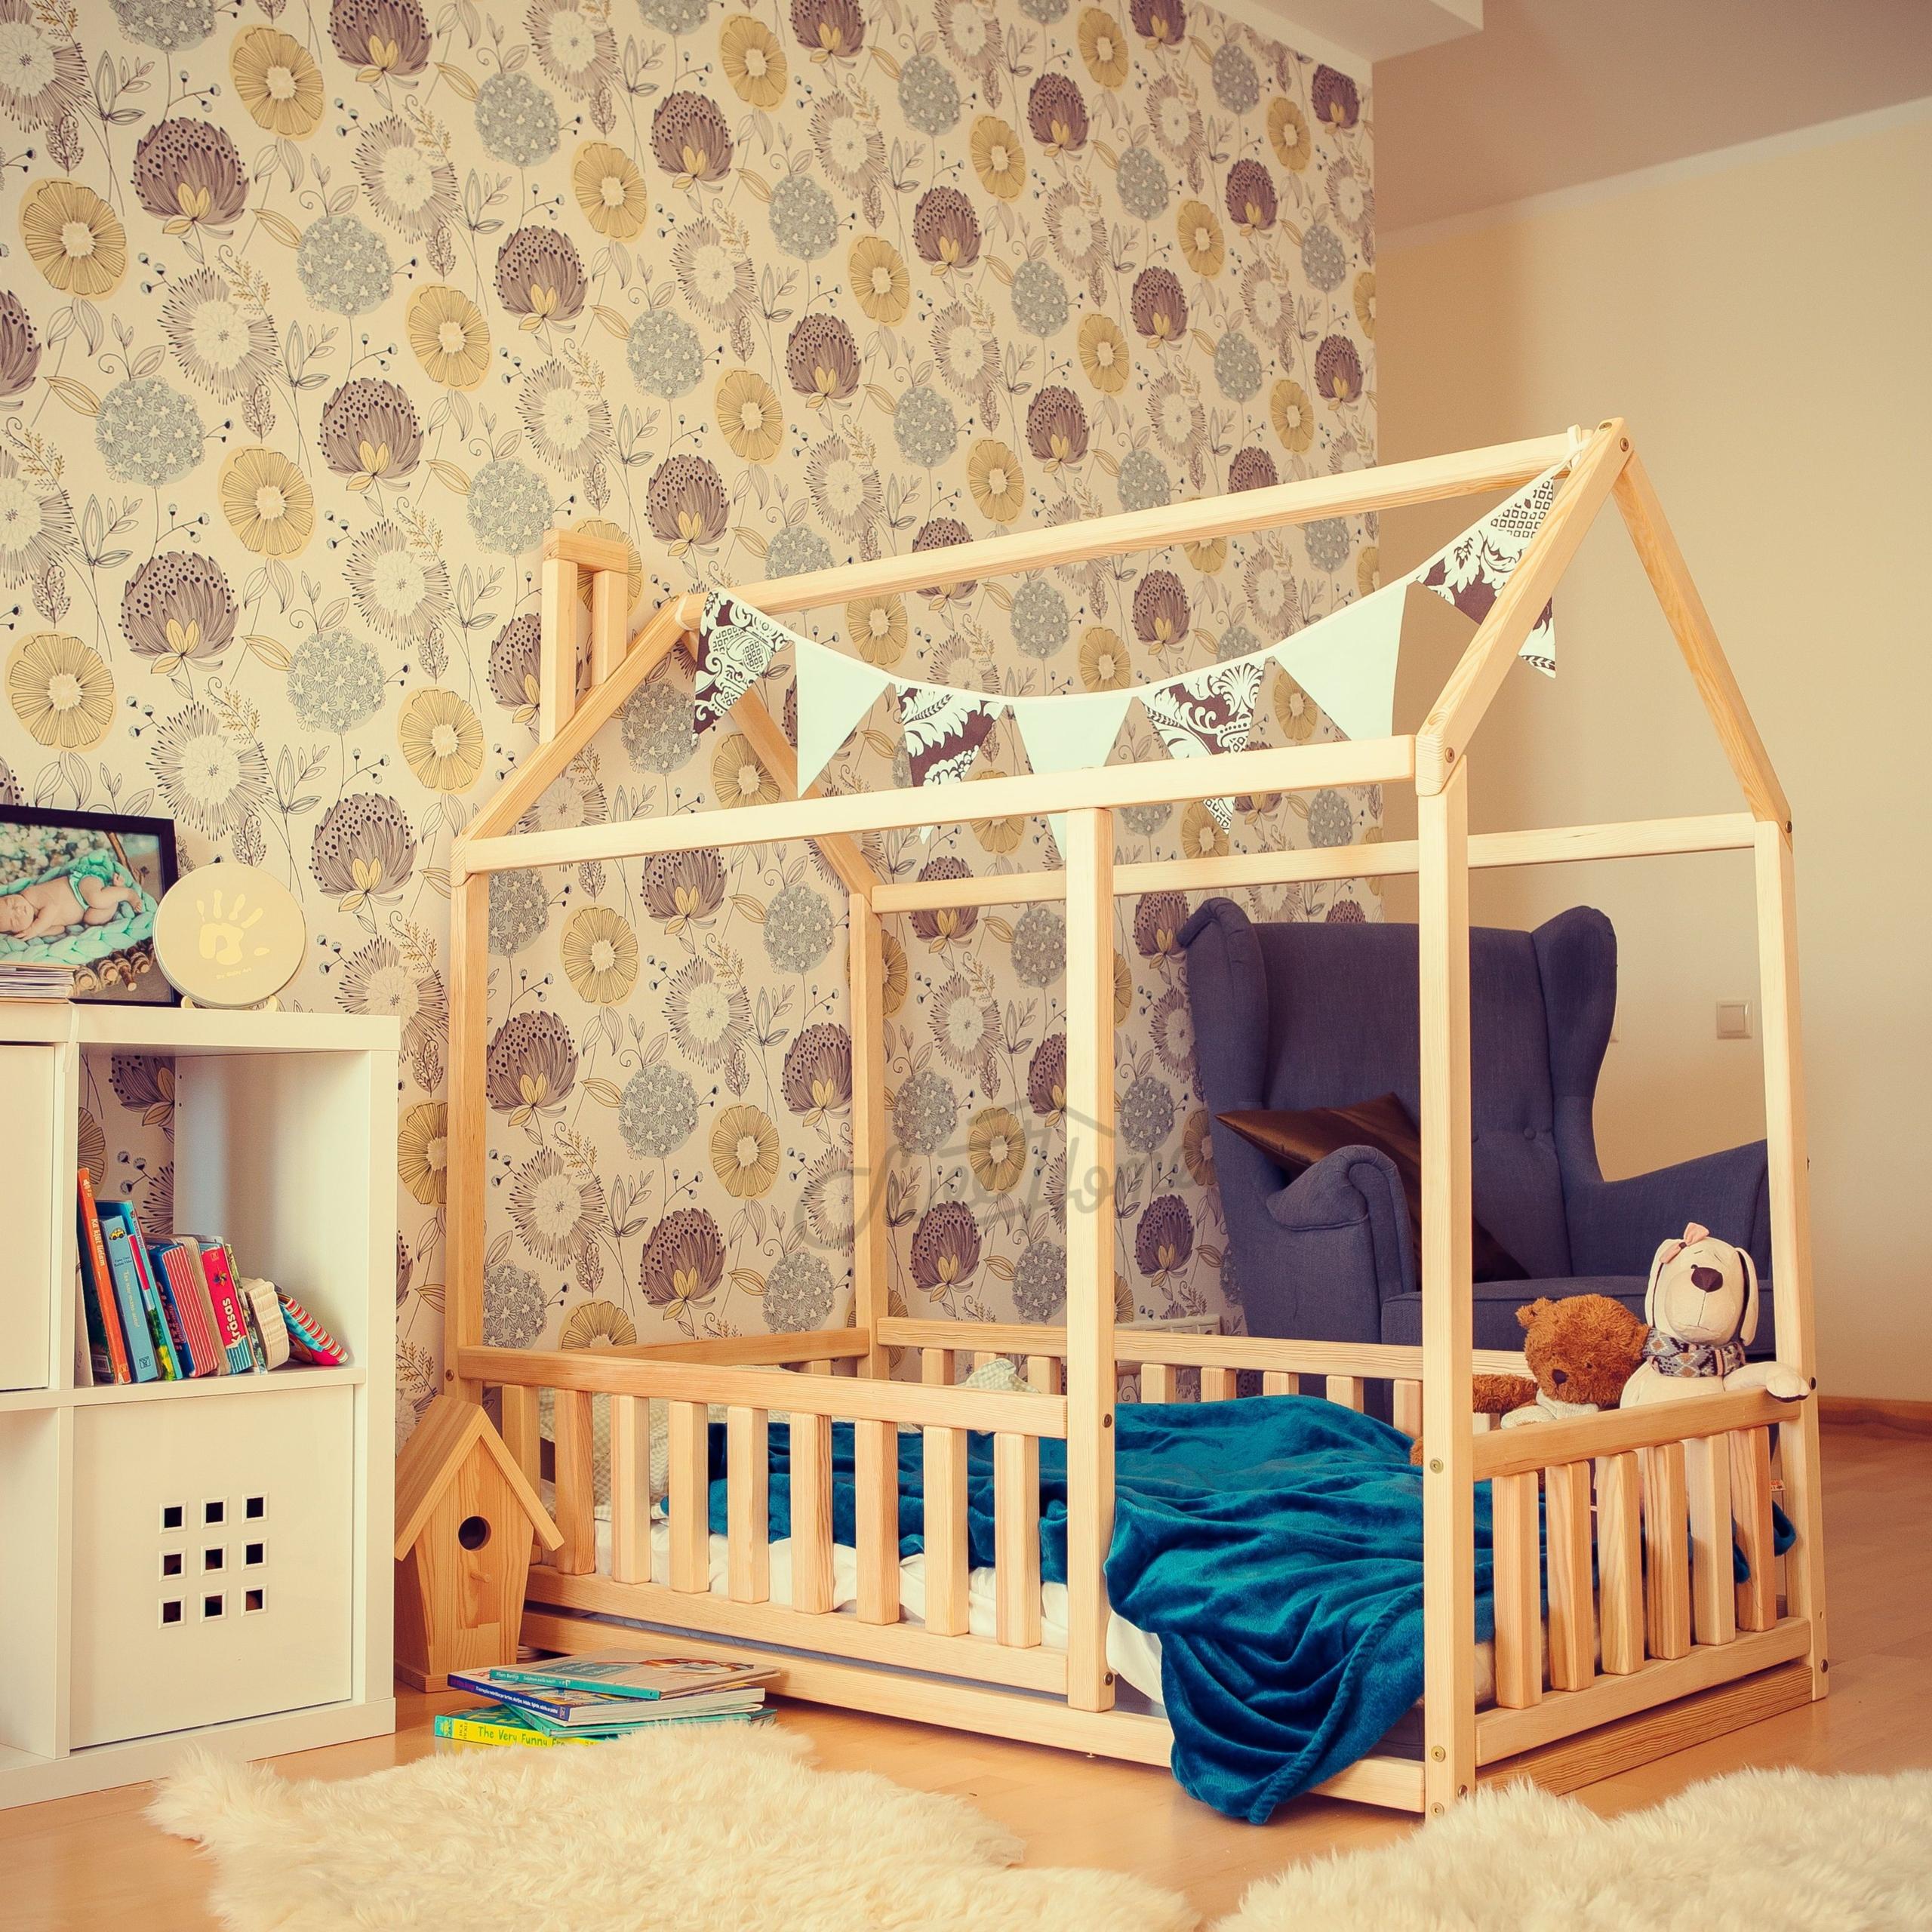 Montessori Toddler Room You Ll Love In 2021 Visualhunt